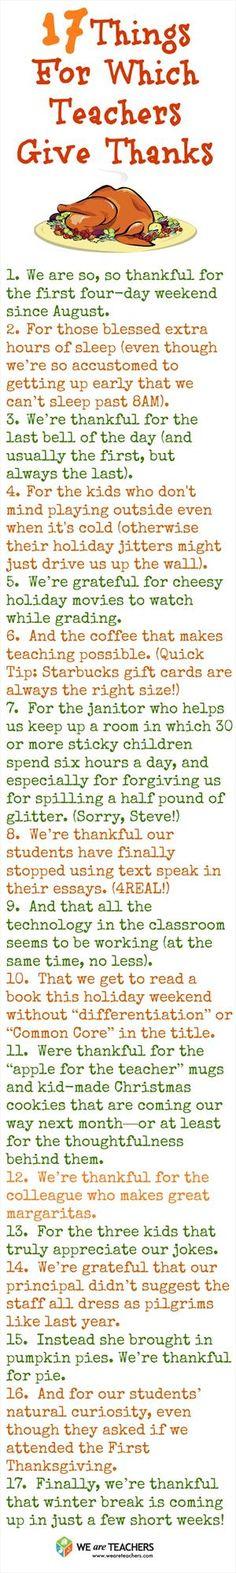 Reasons teachers are thankful! #weareteachers